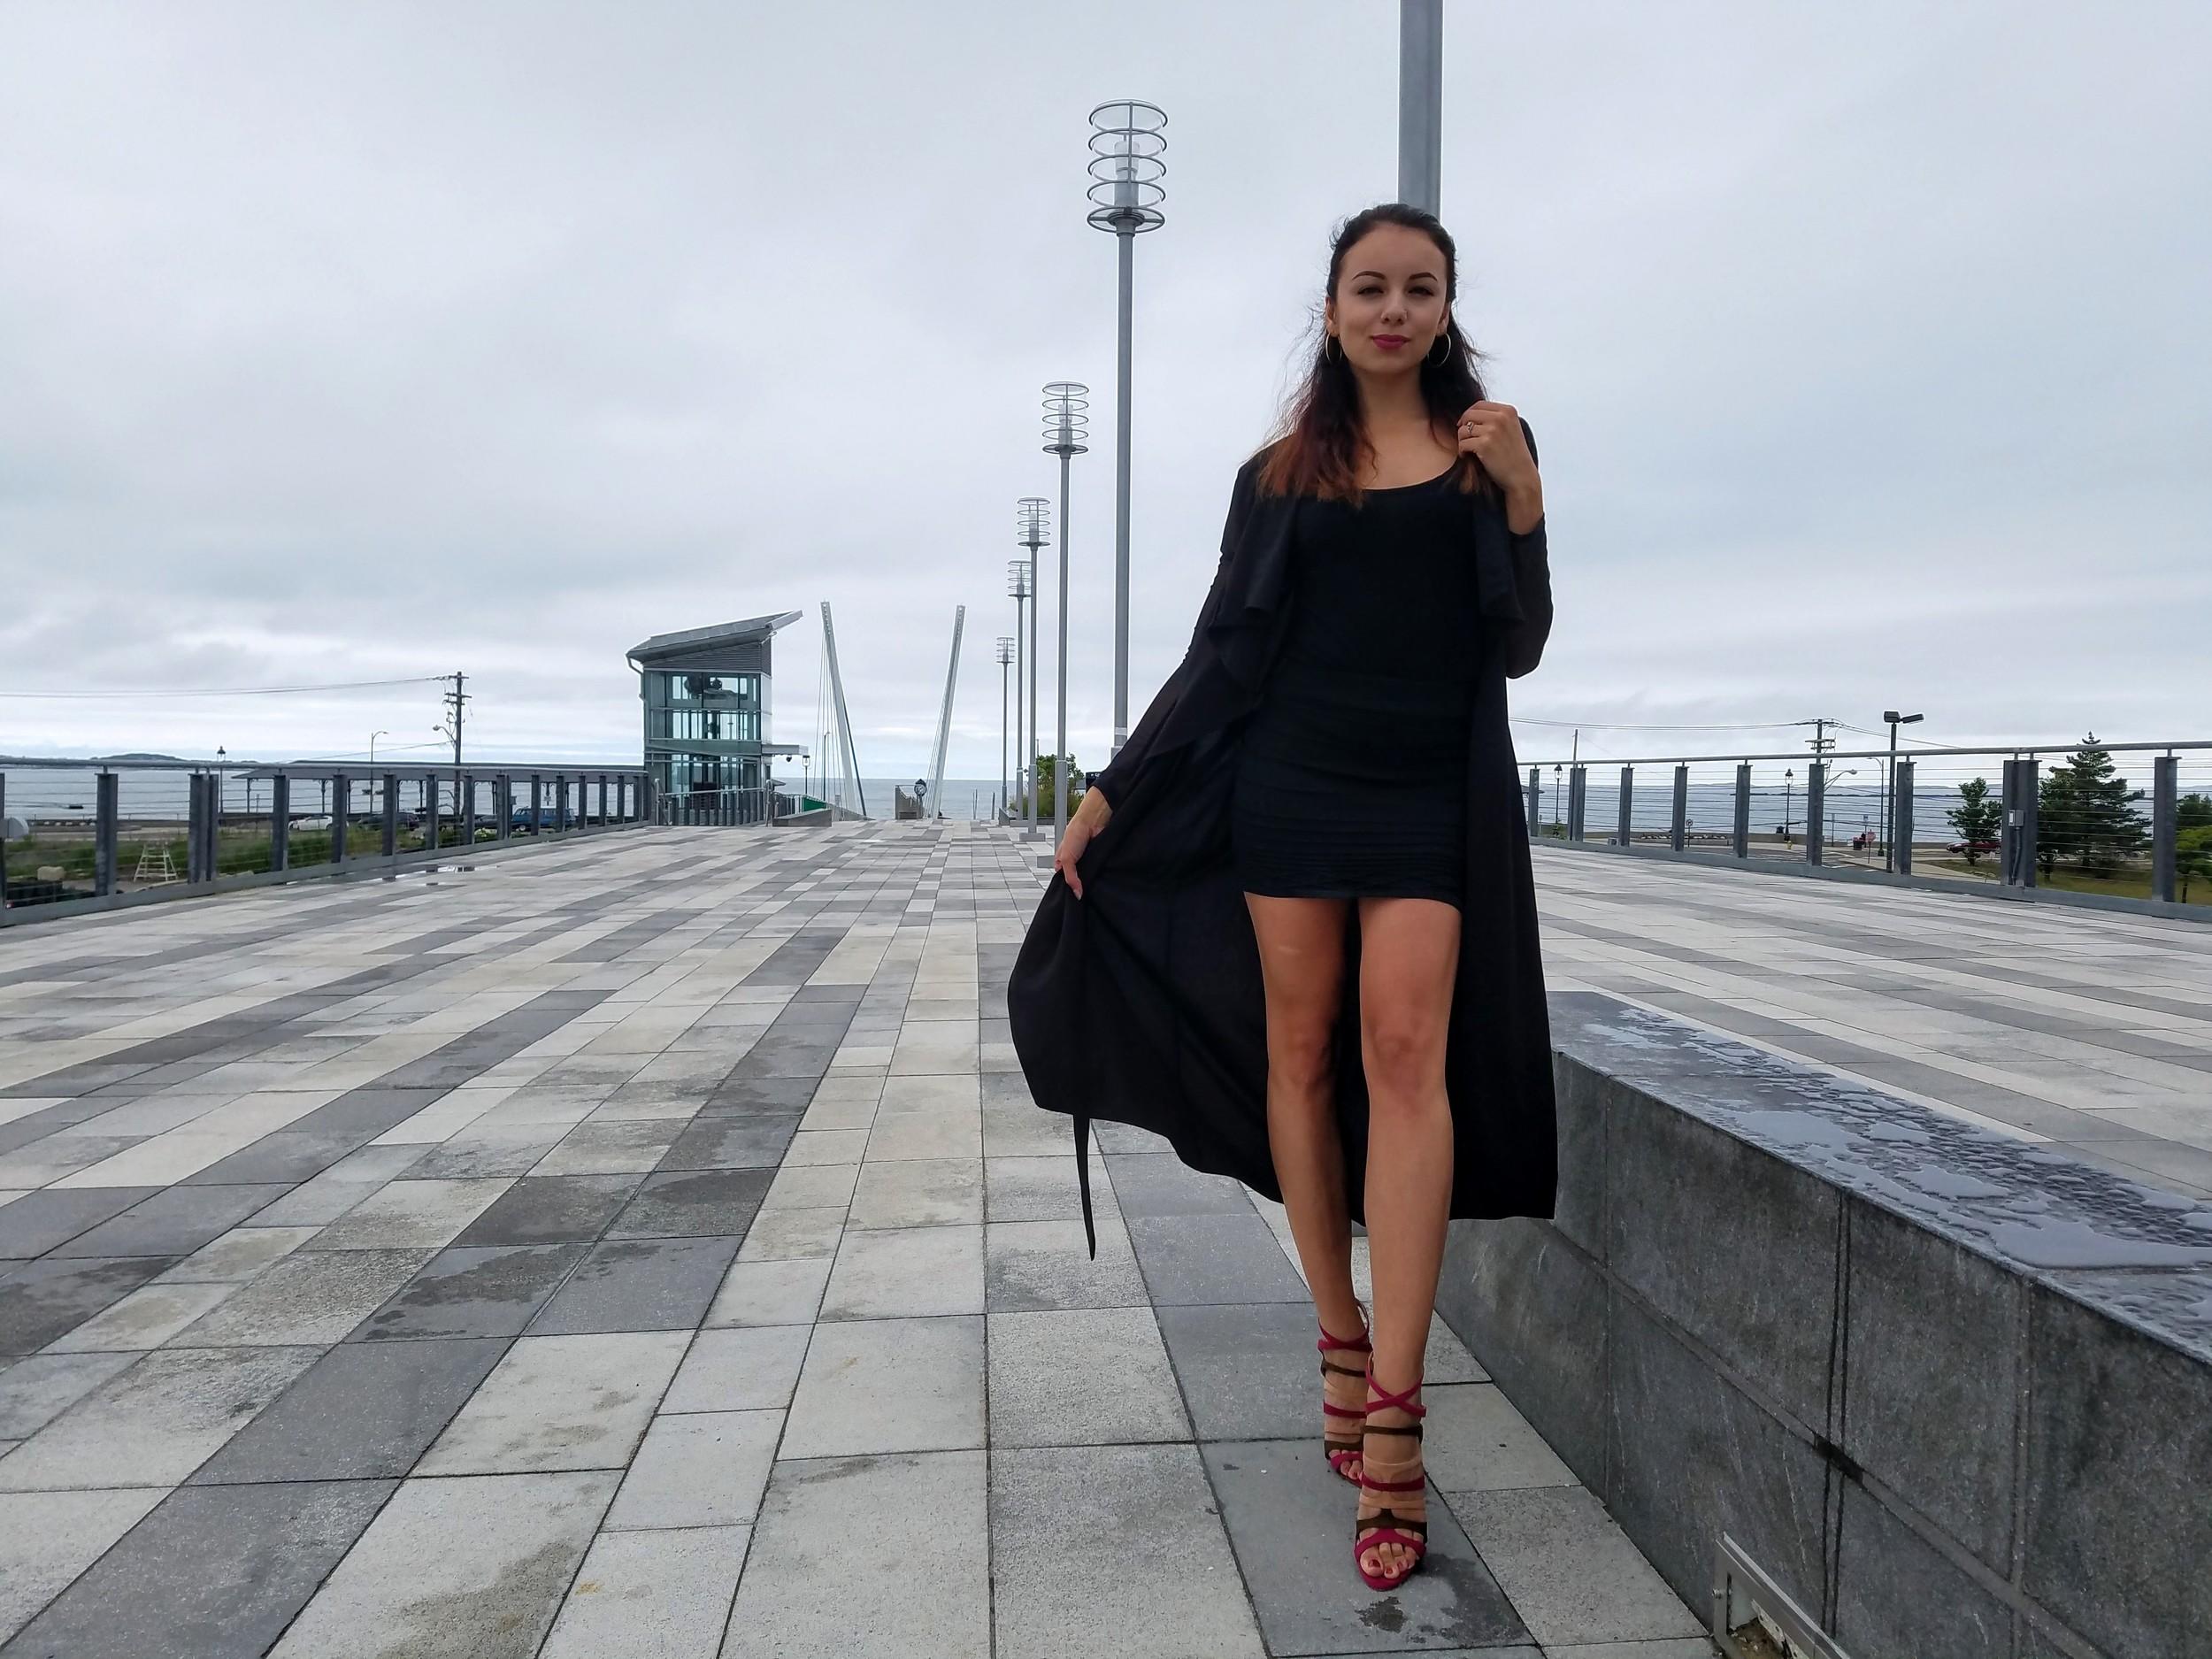 LifeOfArdor, all black outfit, zara heels, high heels, ootd, style, fashion, blogger, lifestyleblogger, fashionblogger